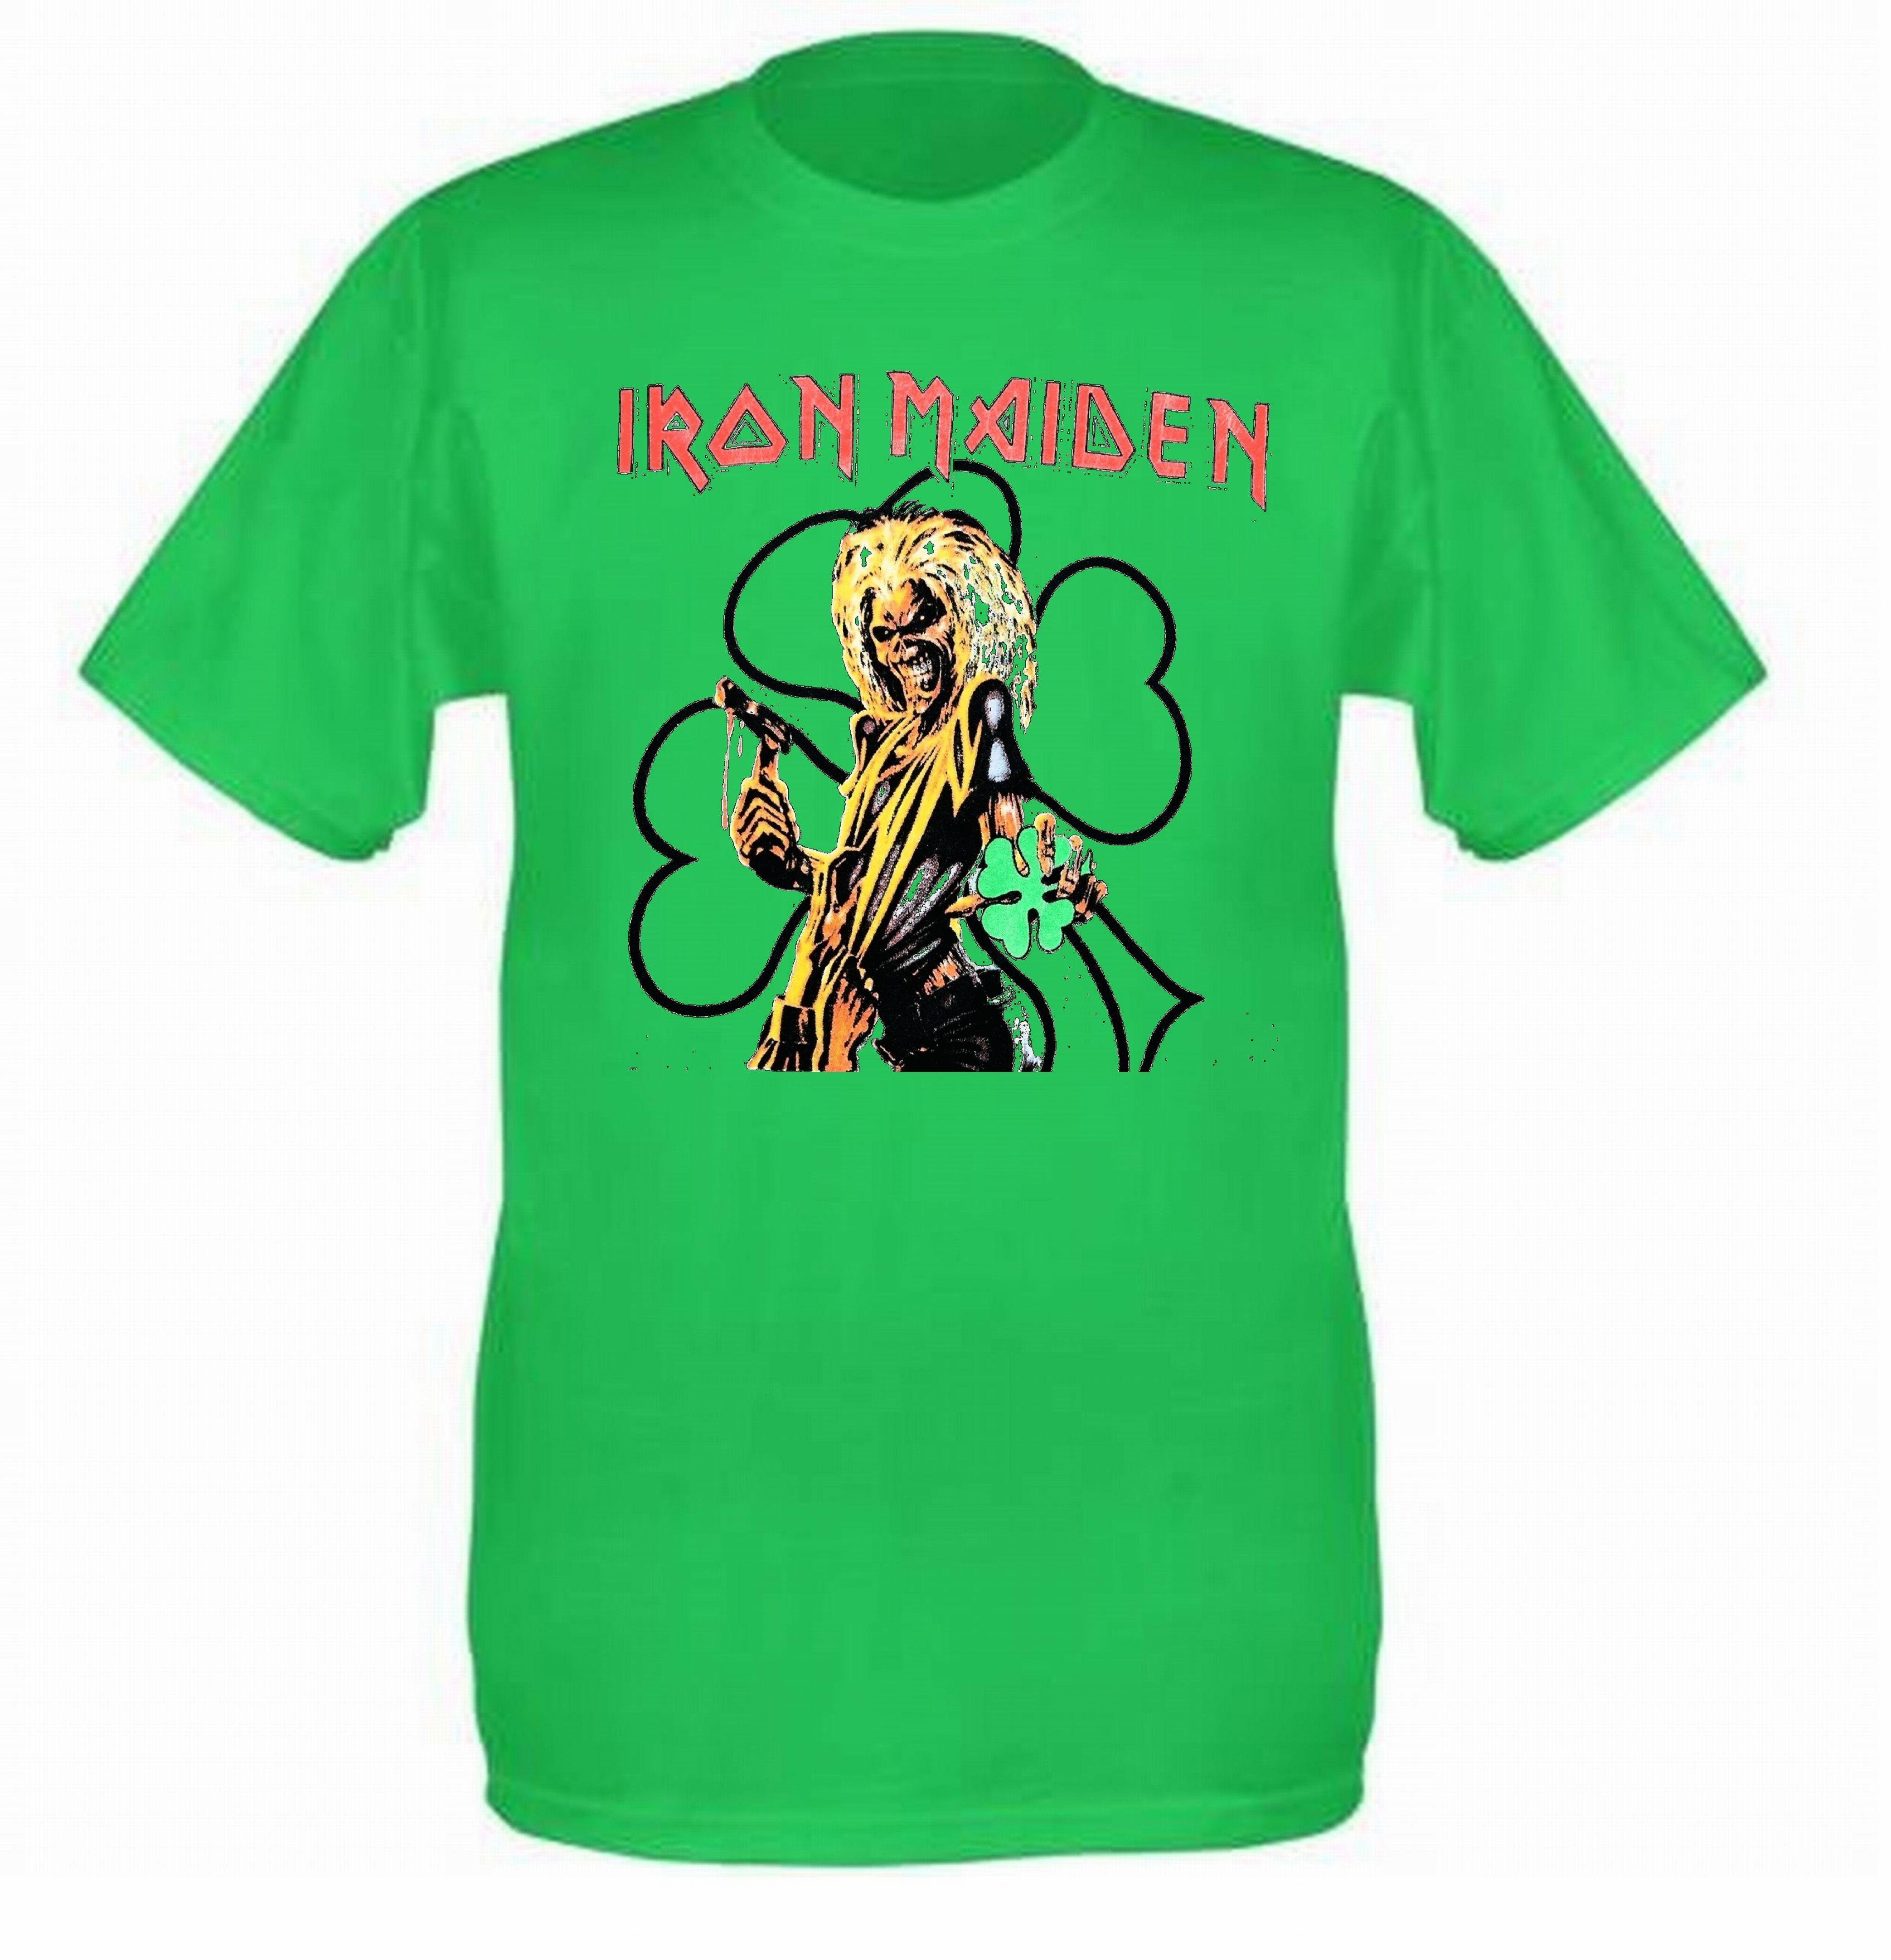 Iron maiden shirt vintage tshirt 1991 st patricks day